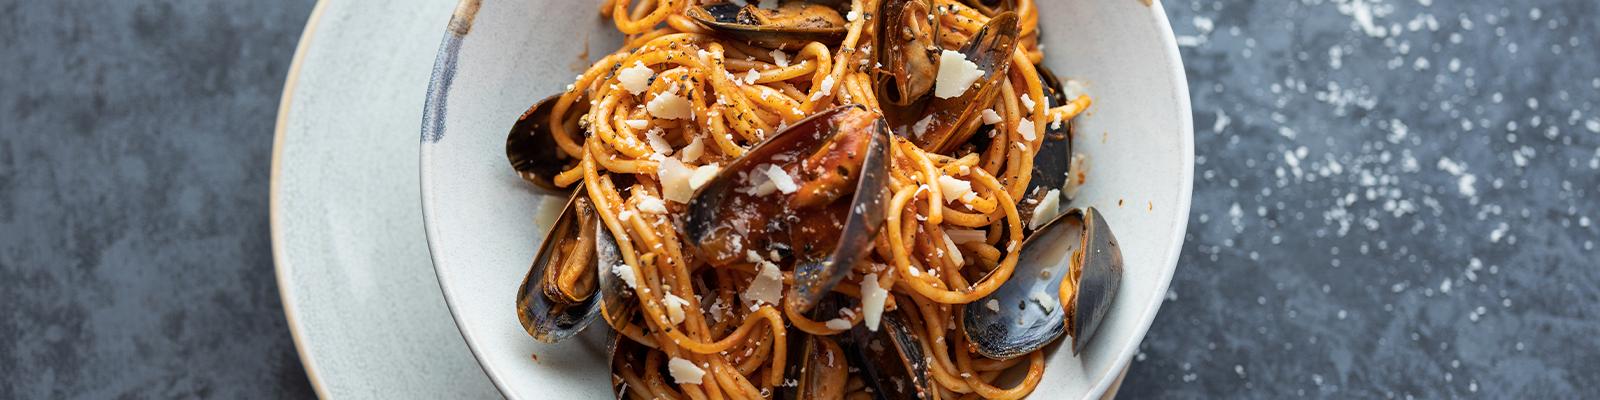 Pasta Garofalo - Linguine con marisco